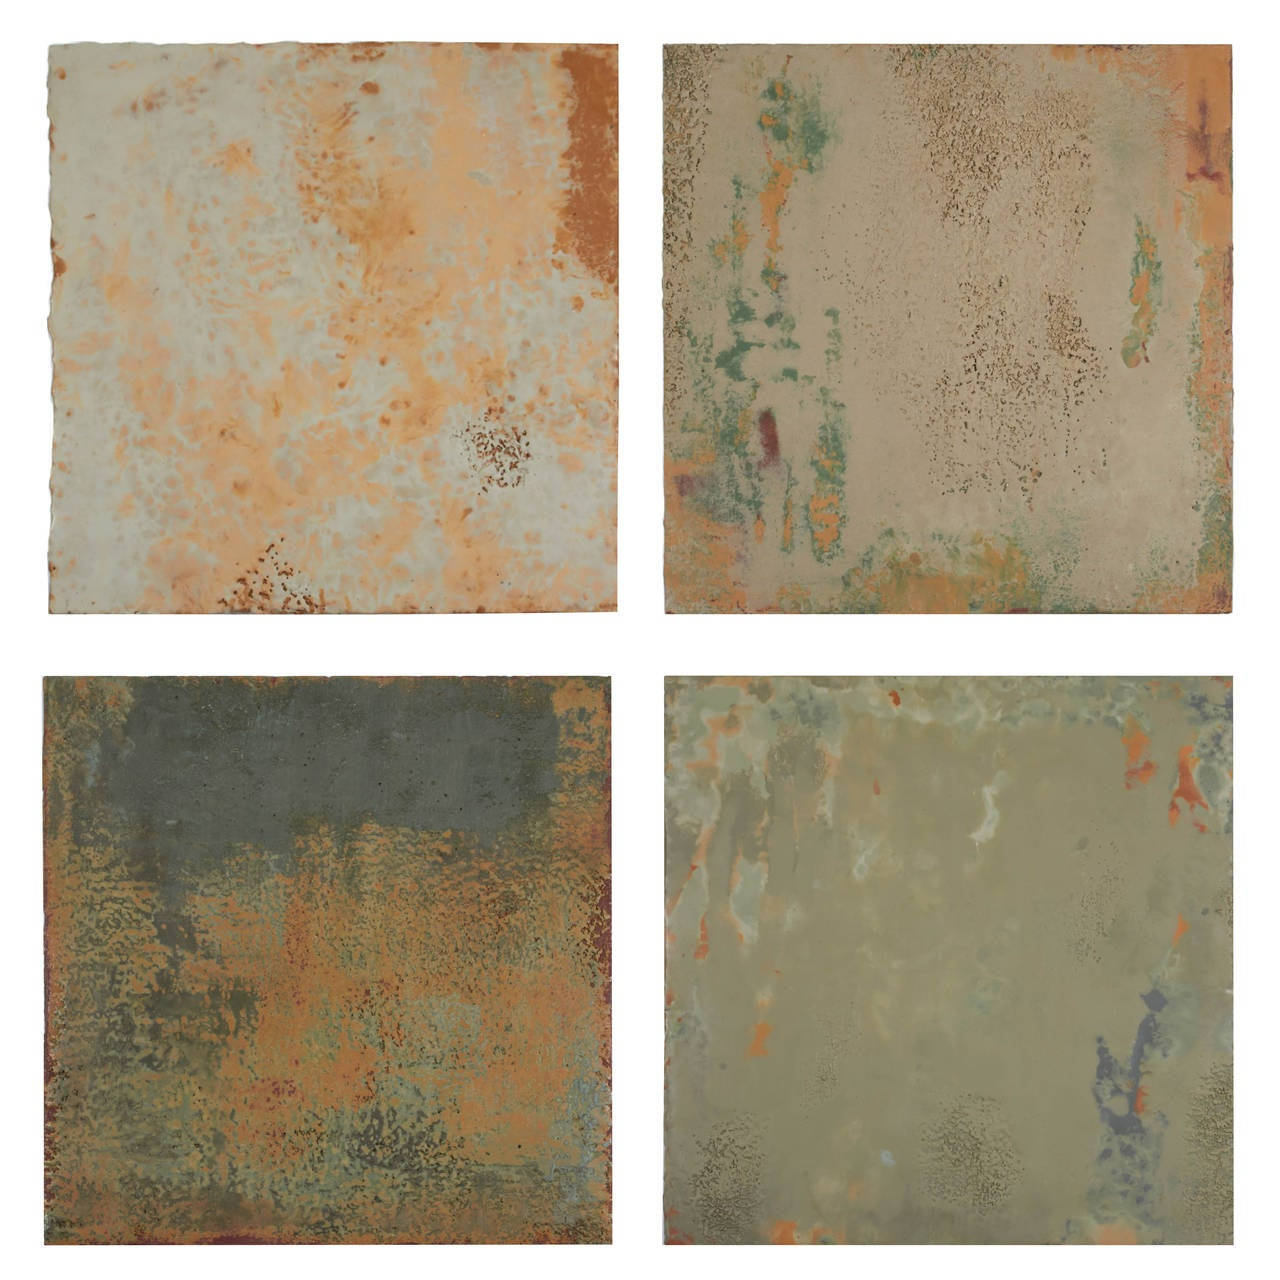 Richard Hirsch Encaustic Painting of Nothing Series, circa 2010-2012